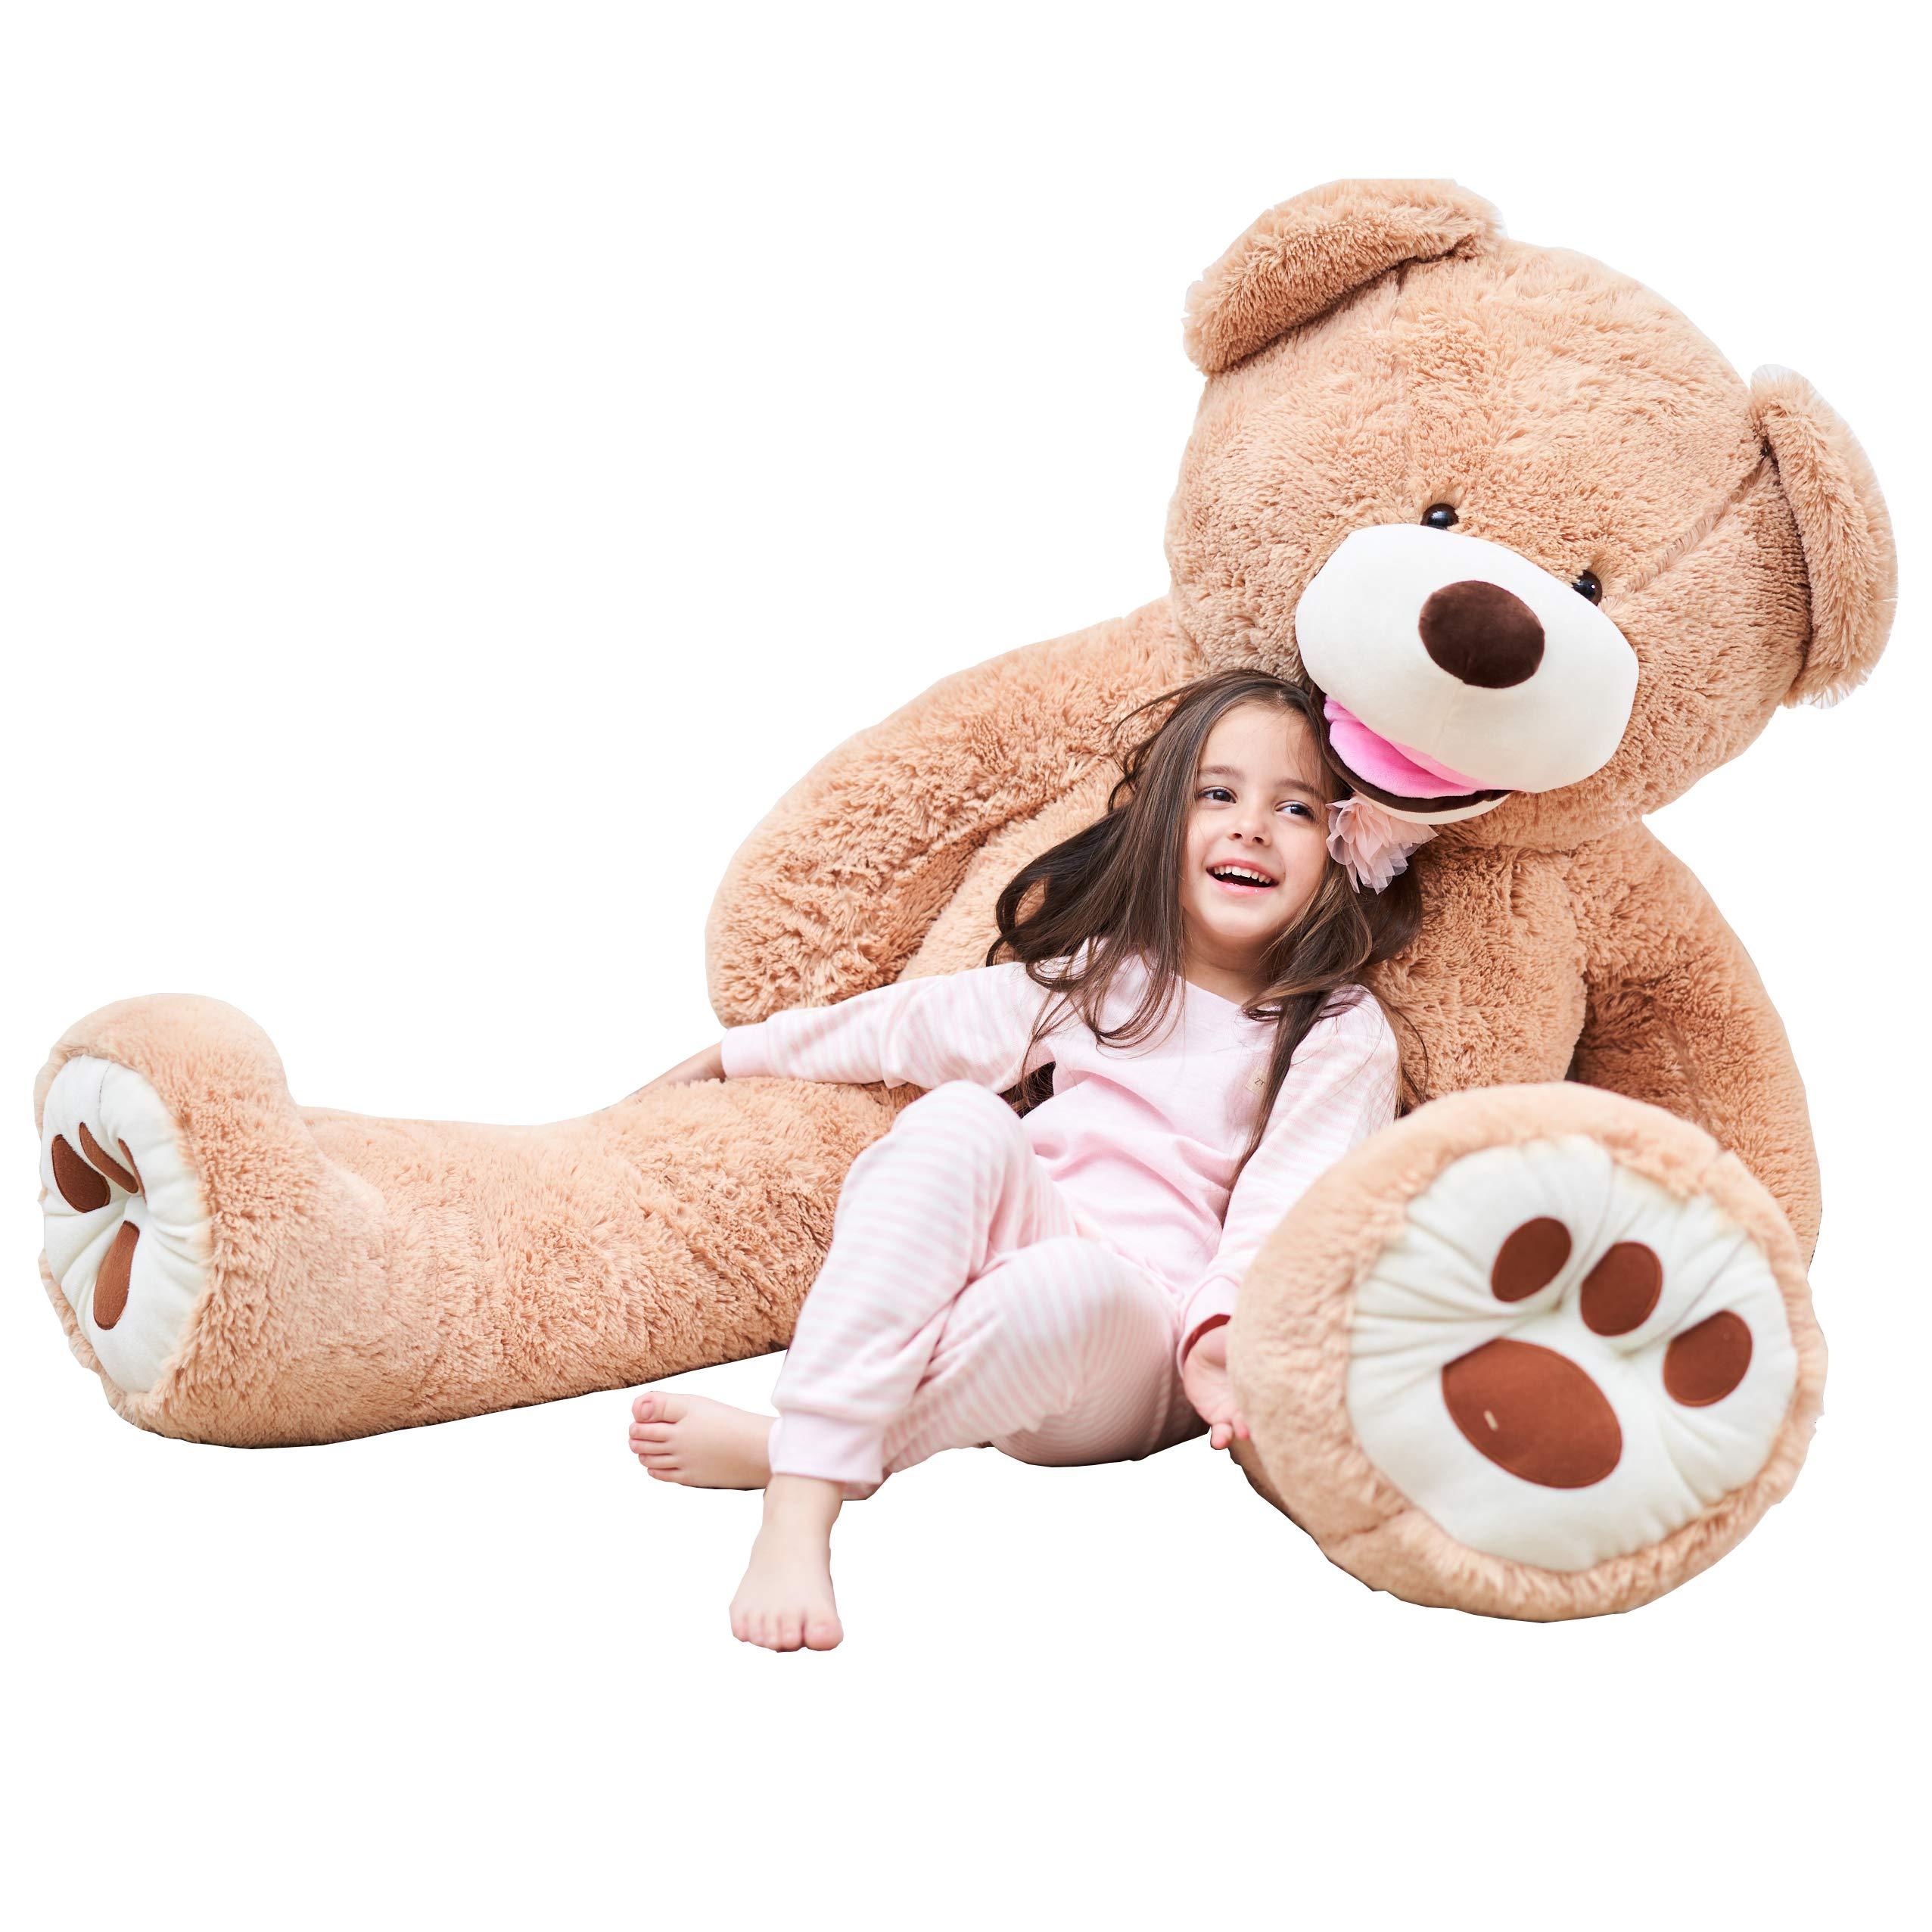 IKASA Giant Teddy Bear Plush Toy Stuffed Animals 5.25 Foot (Brown, 63 inches)